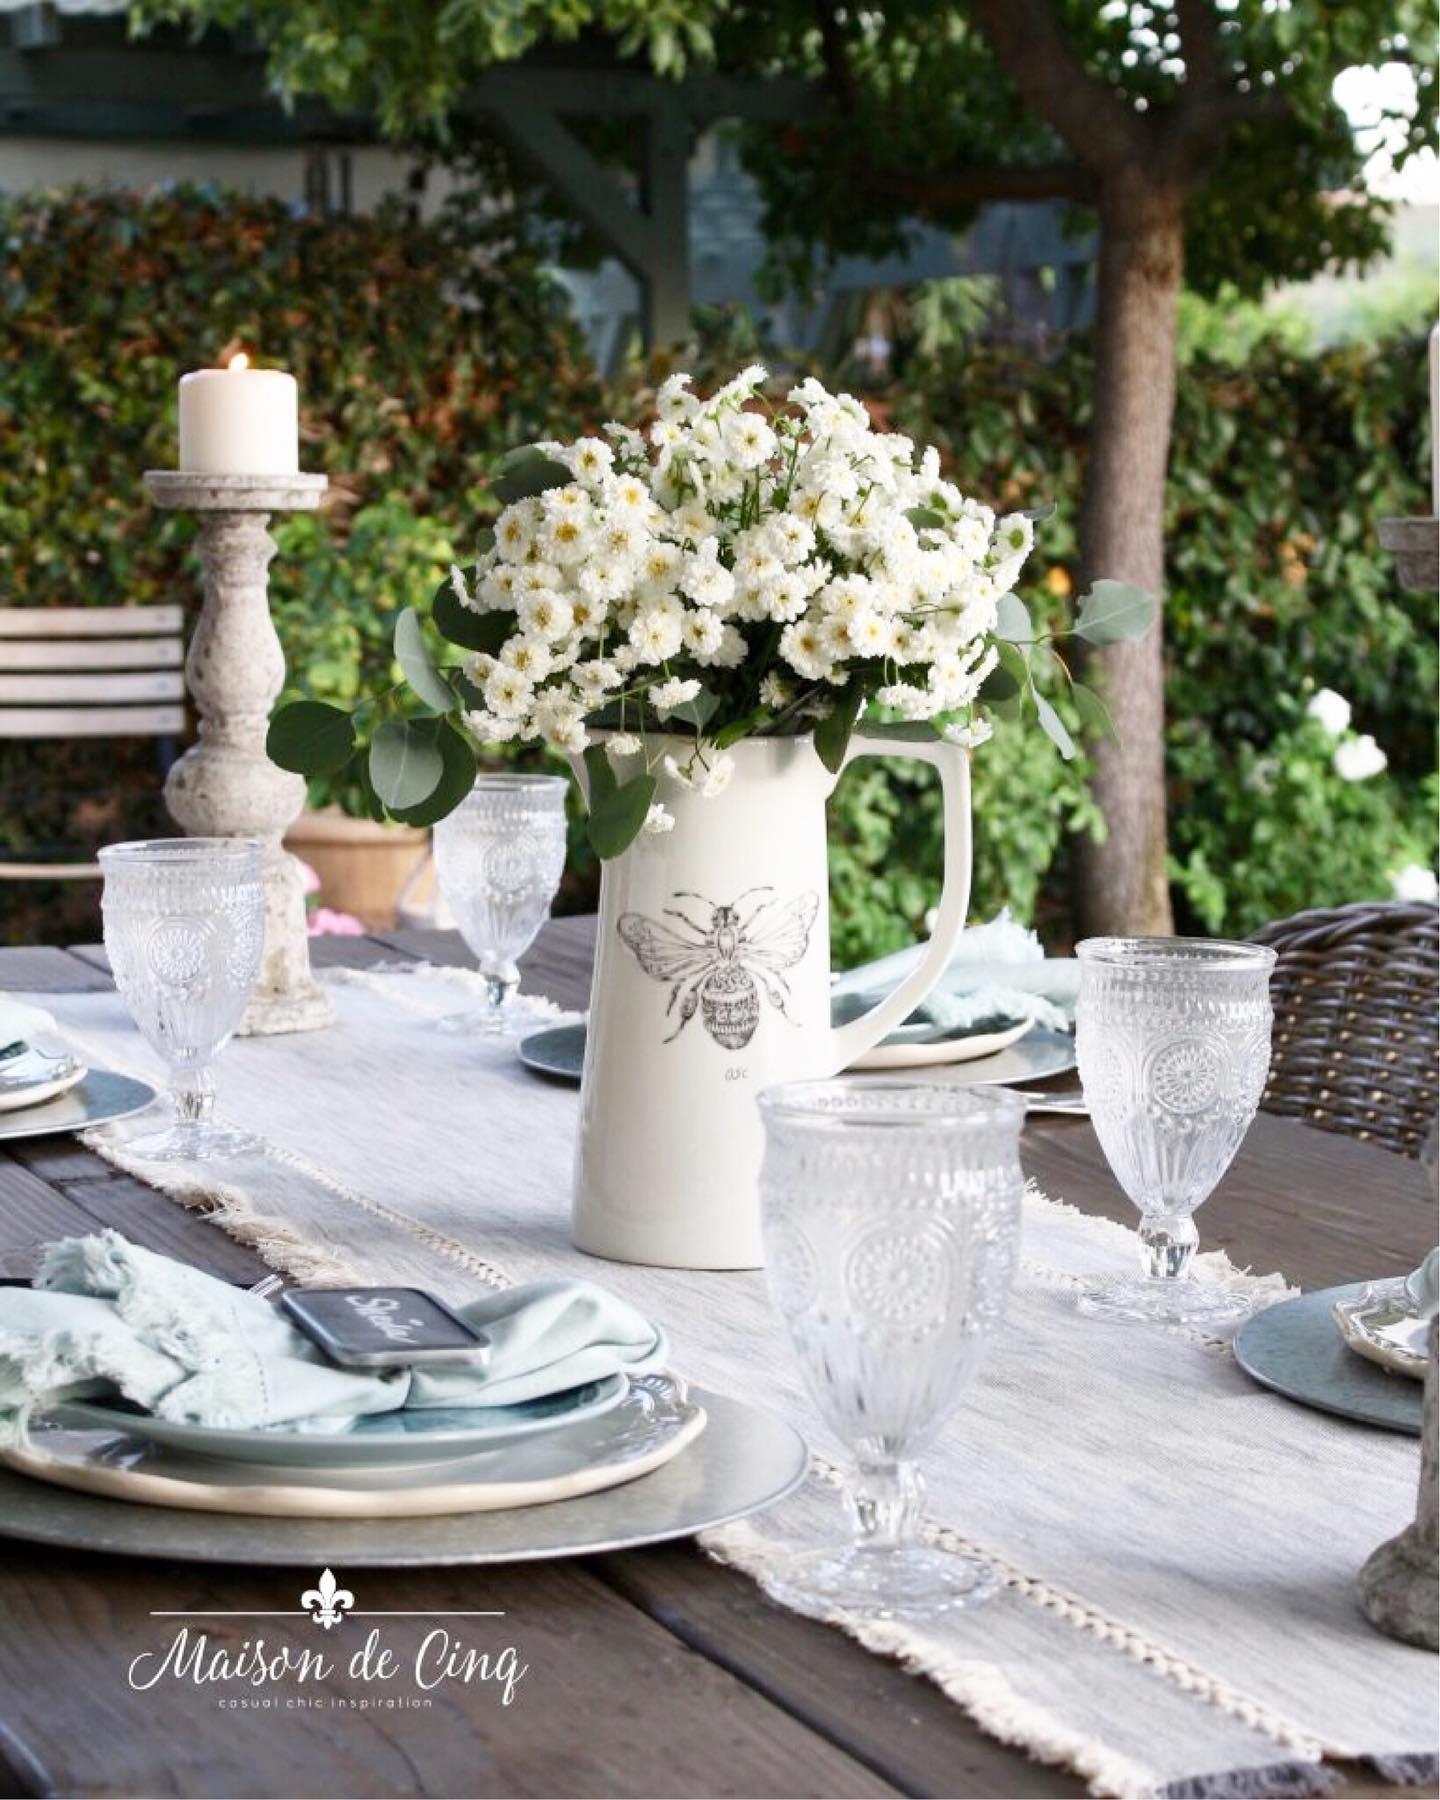 Charming farmhouse picnic Instagram Post